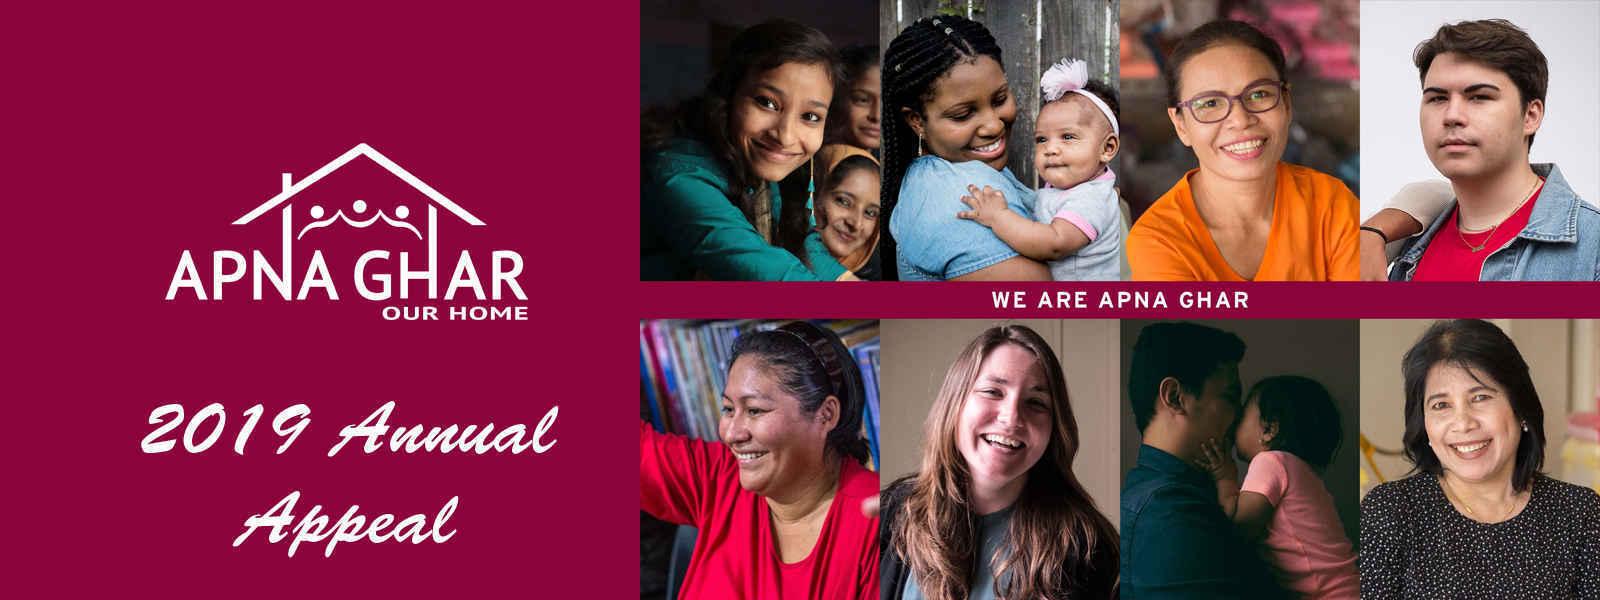 2019 Apna Ghar Annual Appeal  image